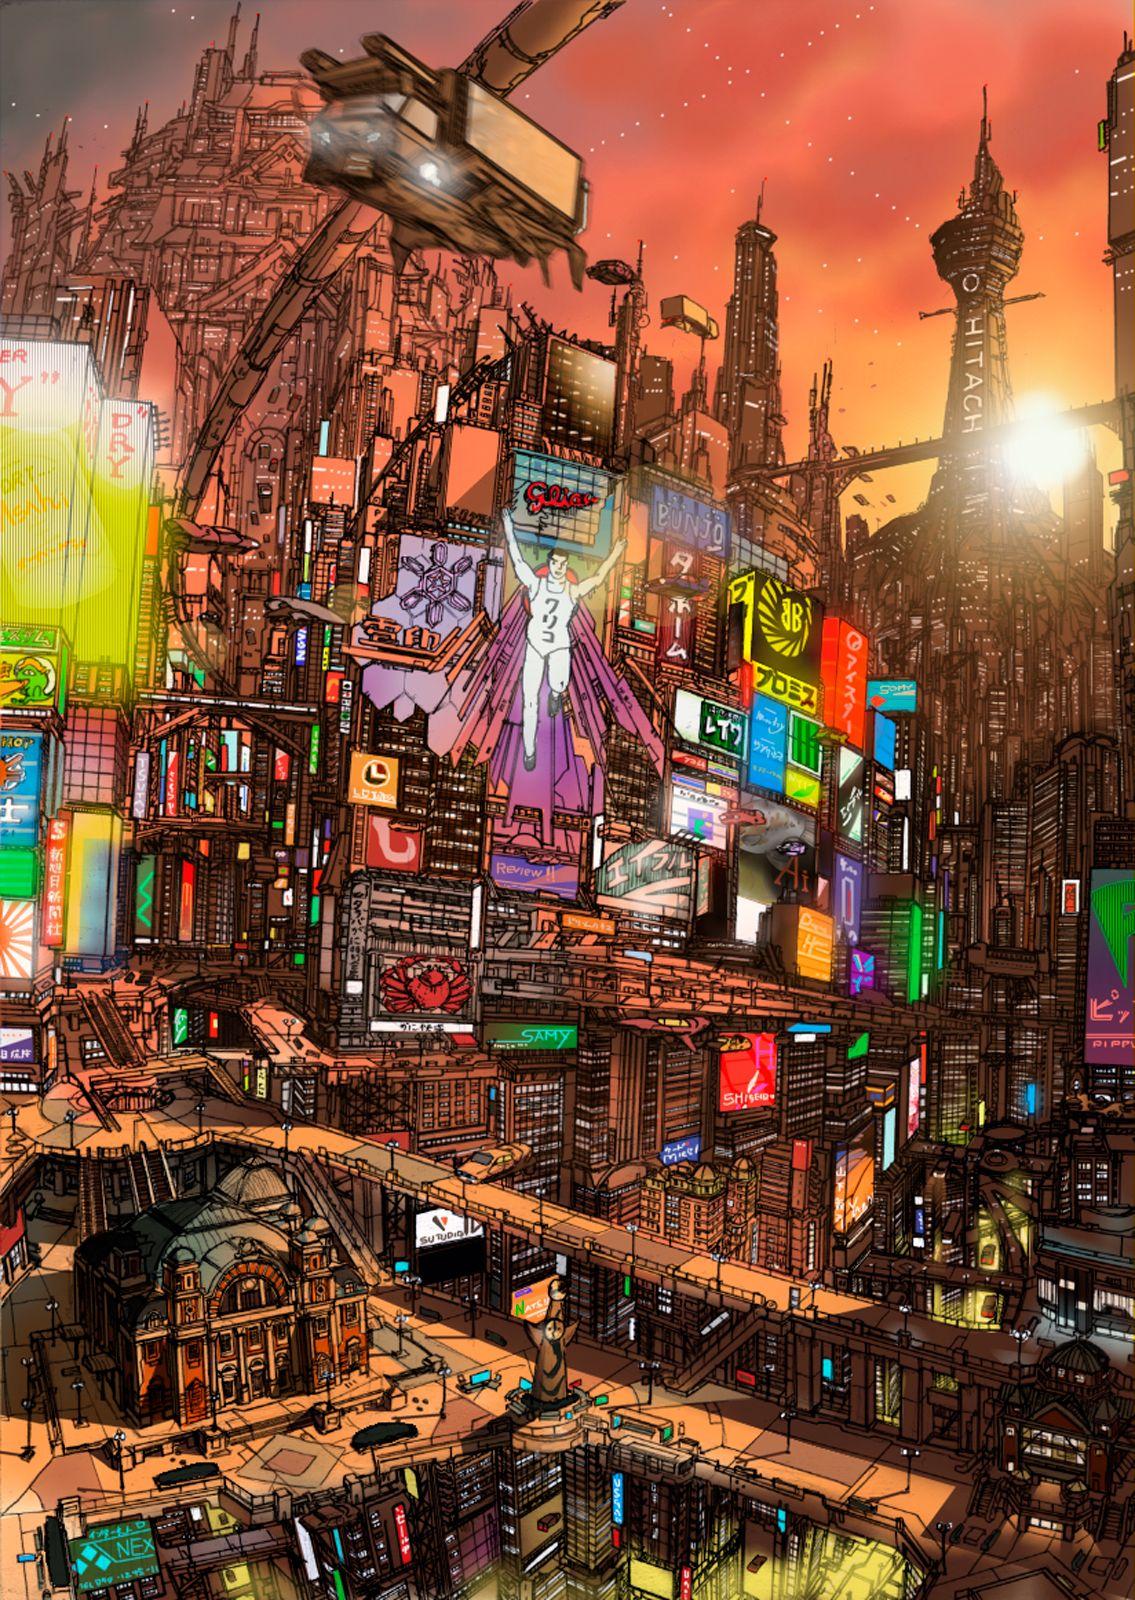 The Art Of Animation, cityscape Concept Art Bonetech3D SteamPunk Fashion Sci-Fi